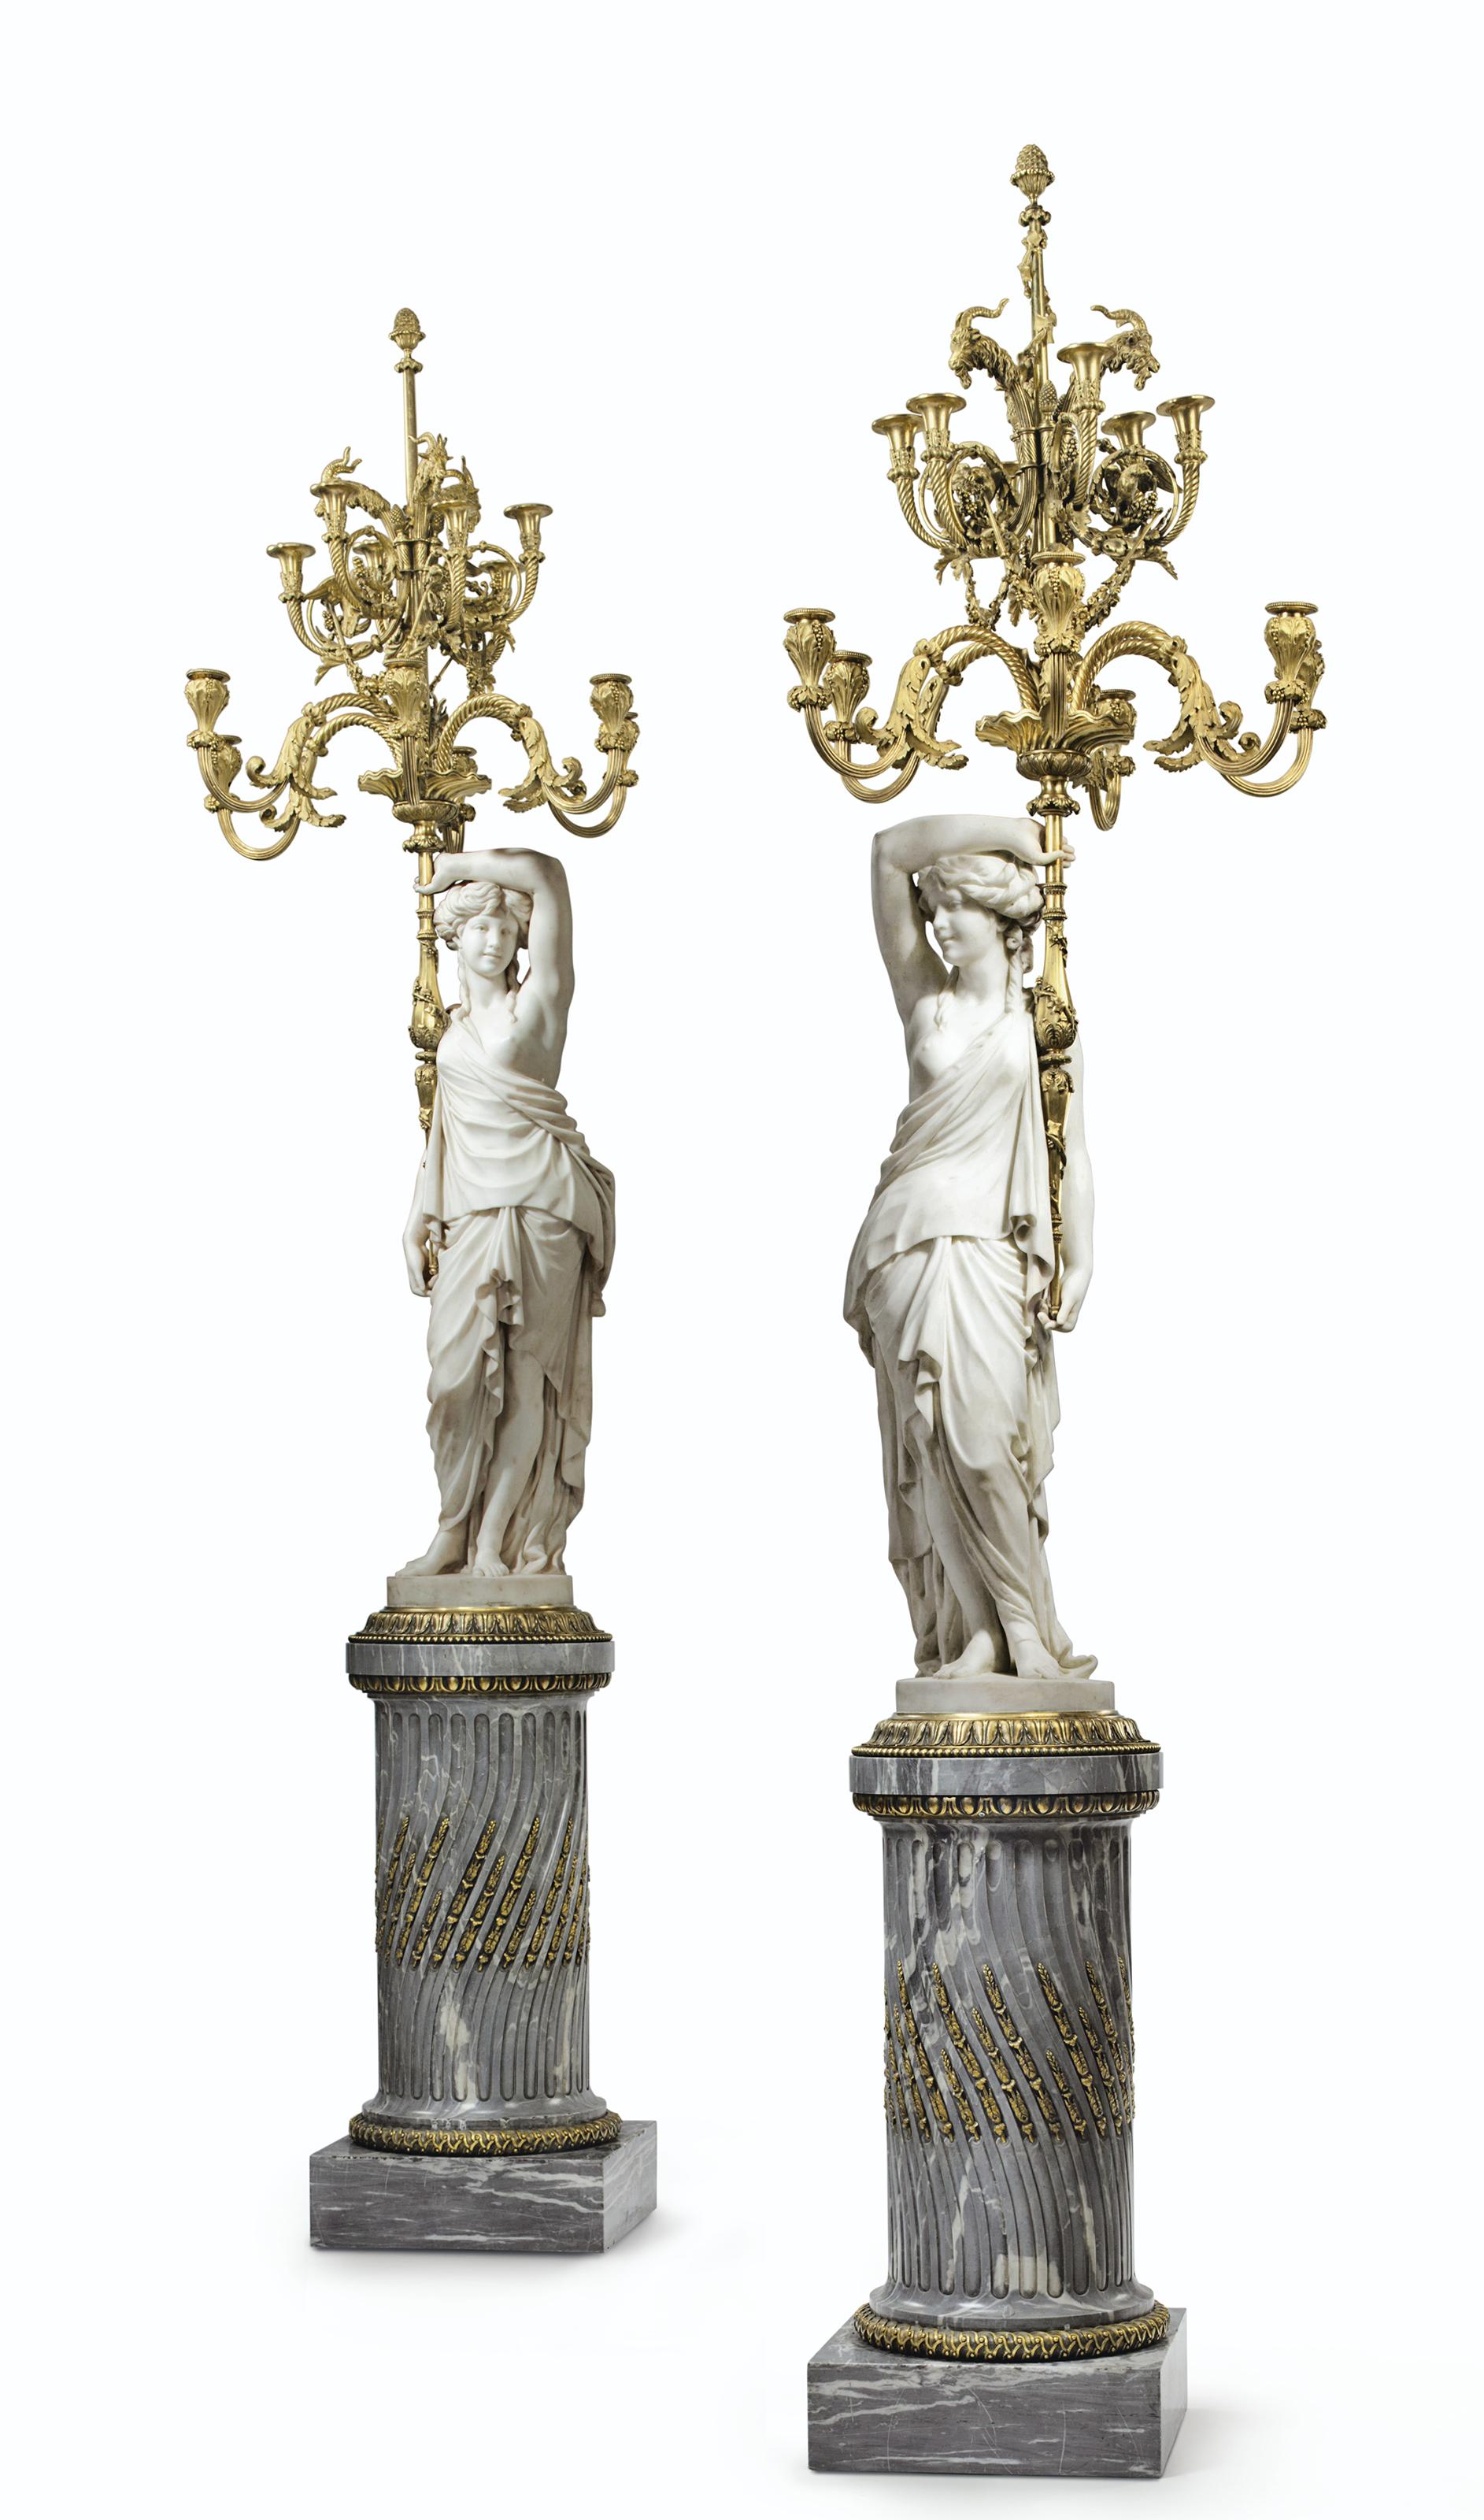 A PAIR OF LARGE FRENCH ORMOLU-MOUNTED BLEU TURQUIN AND CARRARA MARBLE TWELVE-LIGHT TORCHERES